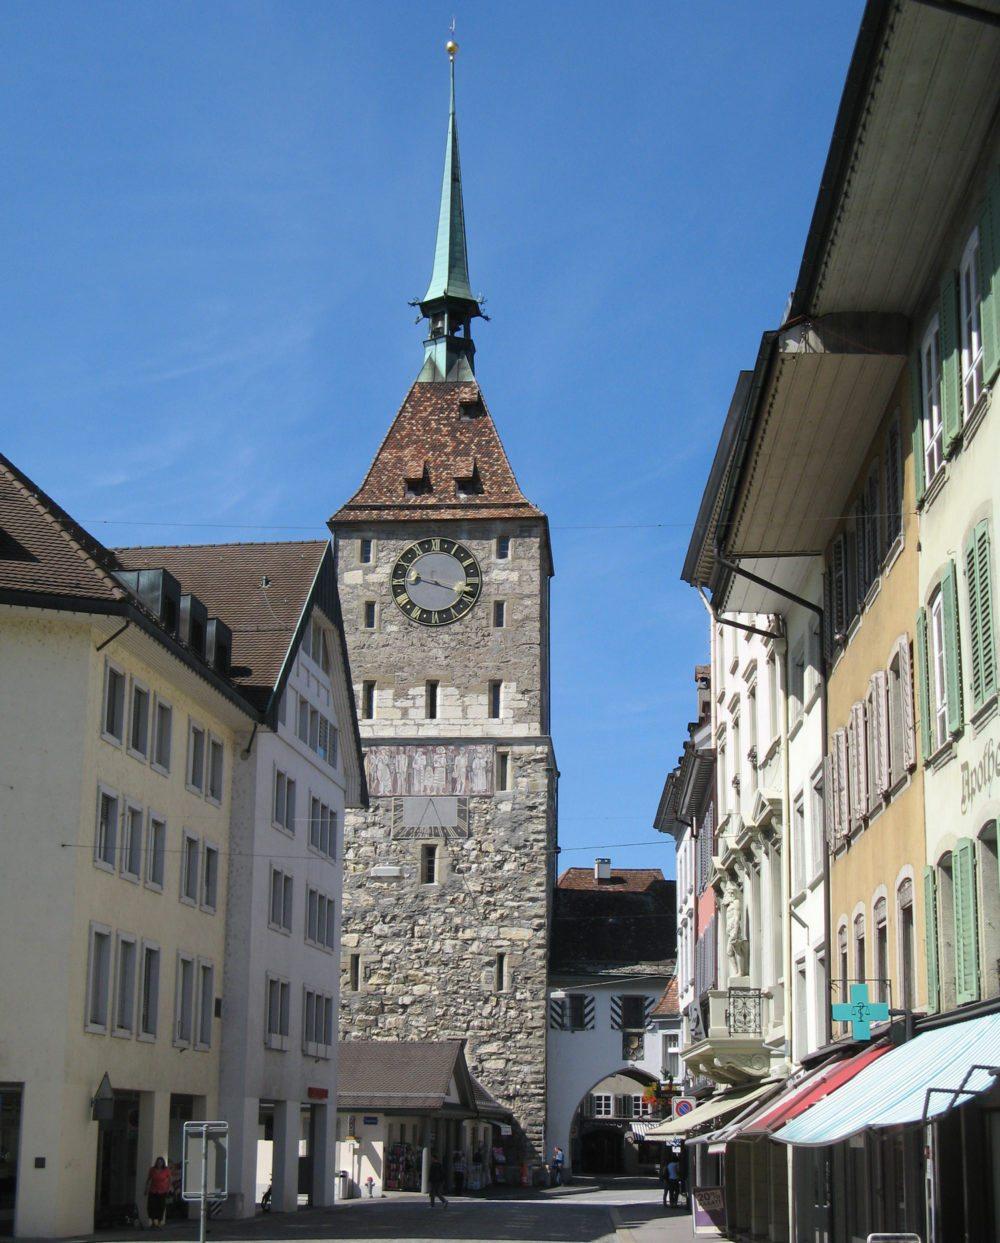 Der Obertorturm in Aarau (Bild: Voyager, Wikimedia, CC)